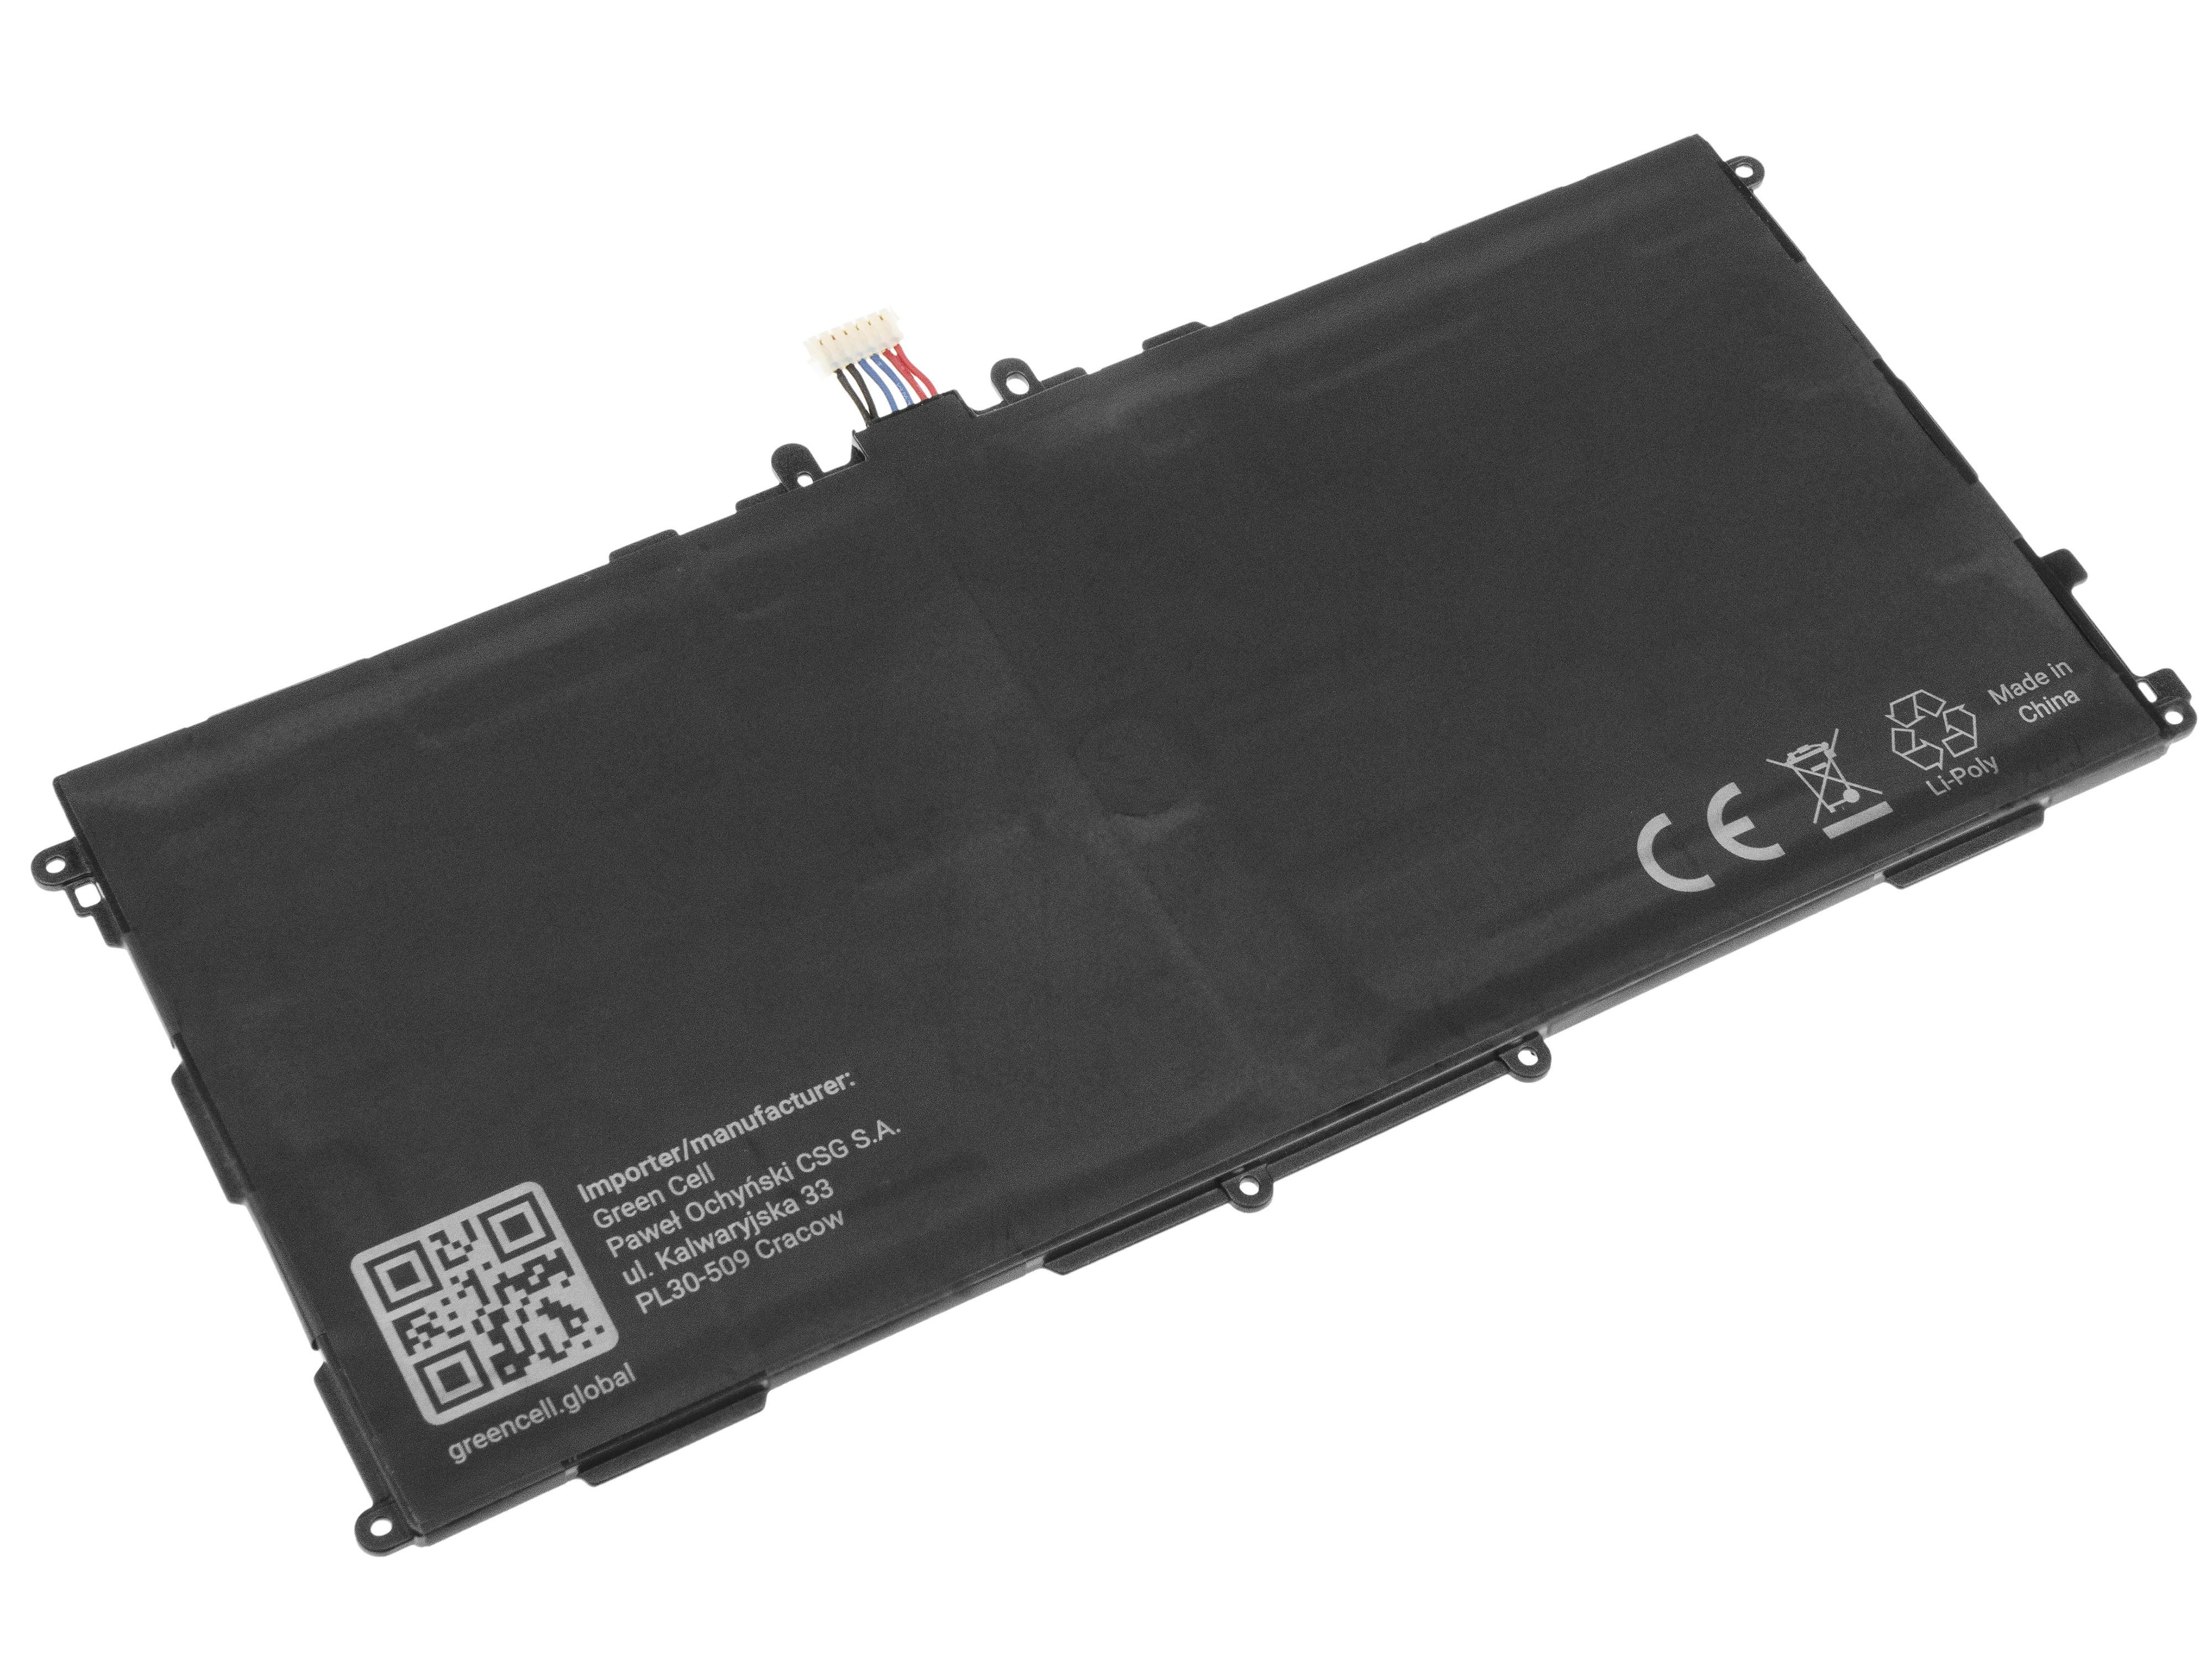 Green Cell TAB22 Baterie Samsung T8220E pro Samsung Galaxy Note 10.1 SM-P600 SM-P601 SM-P605 6600mAh Li-Pol – neoriginální